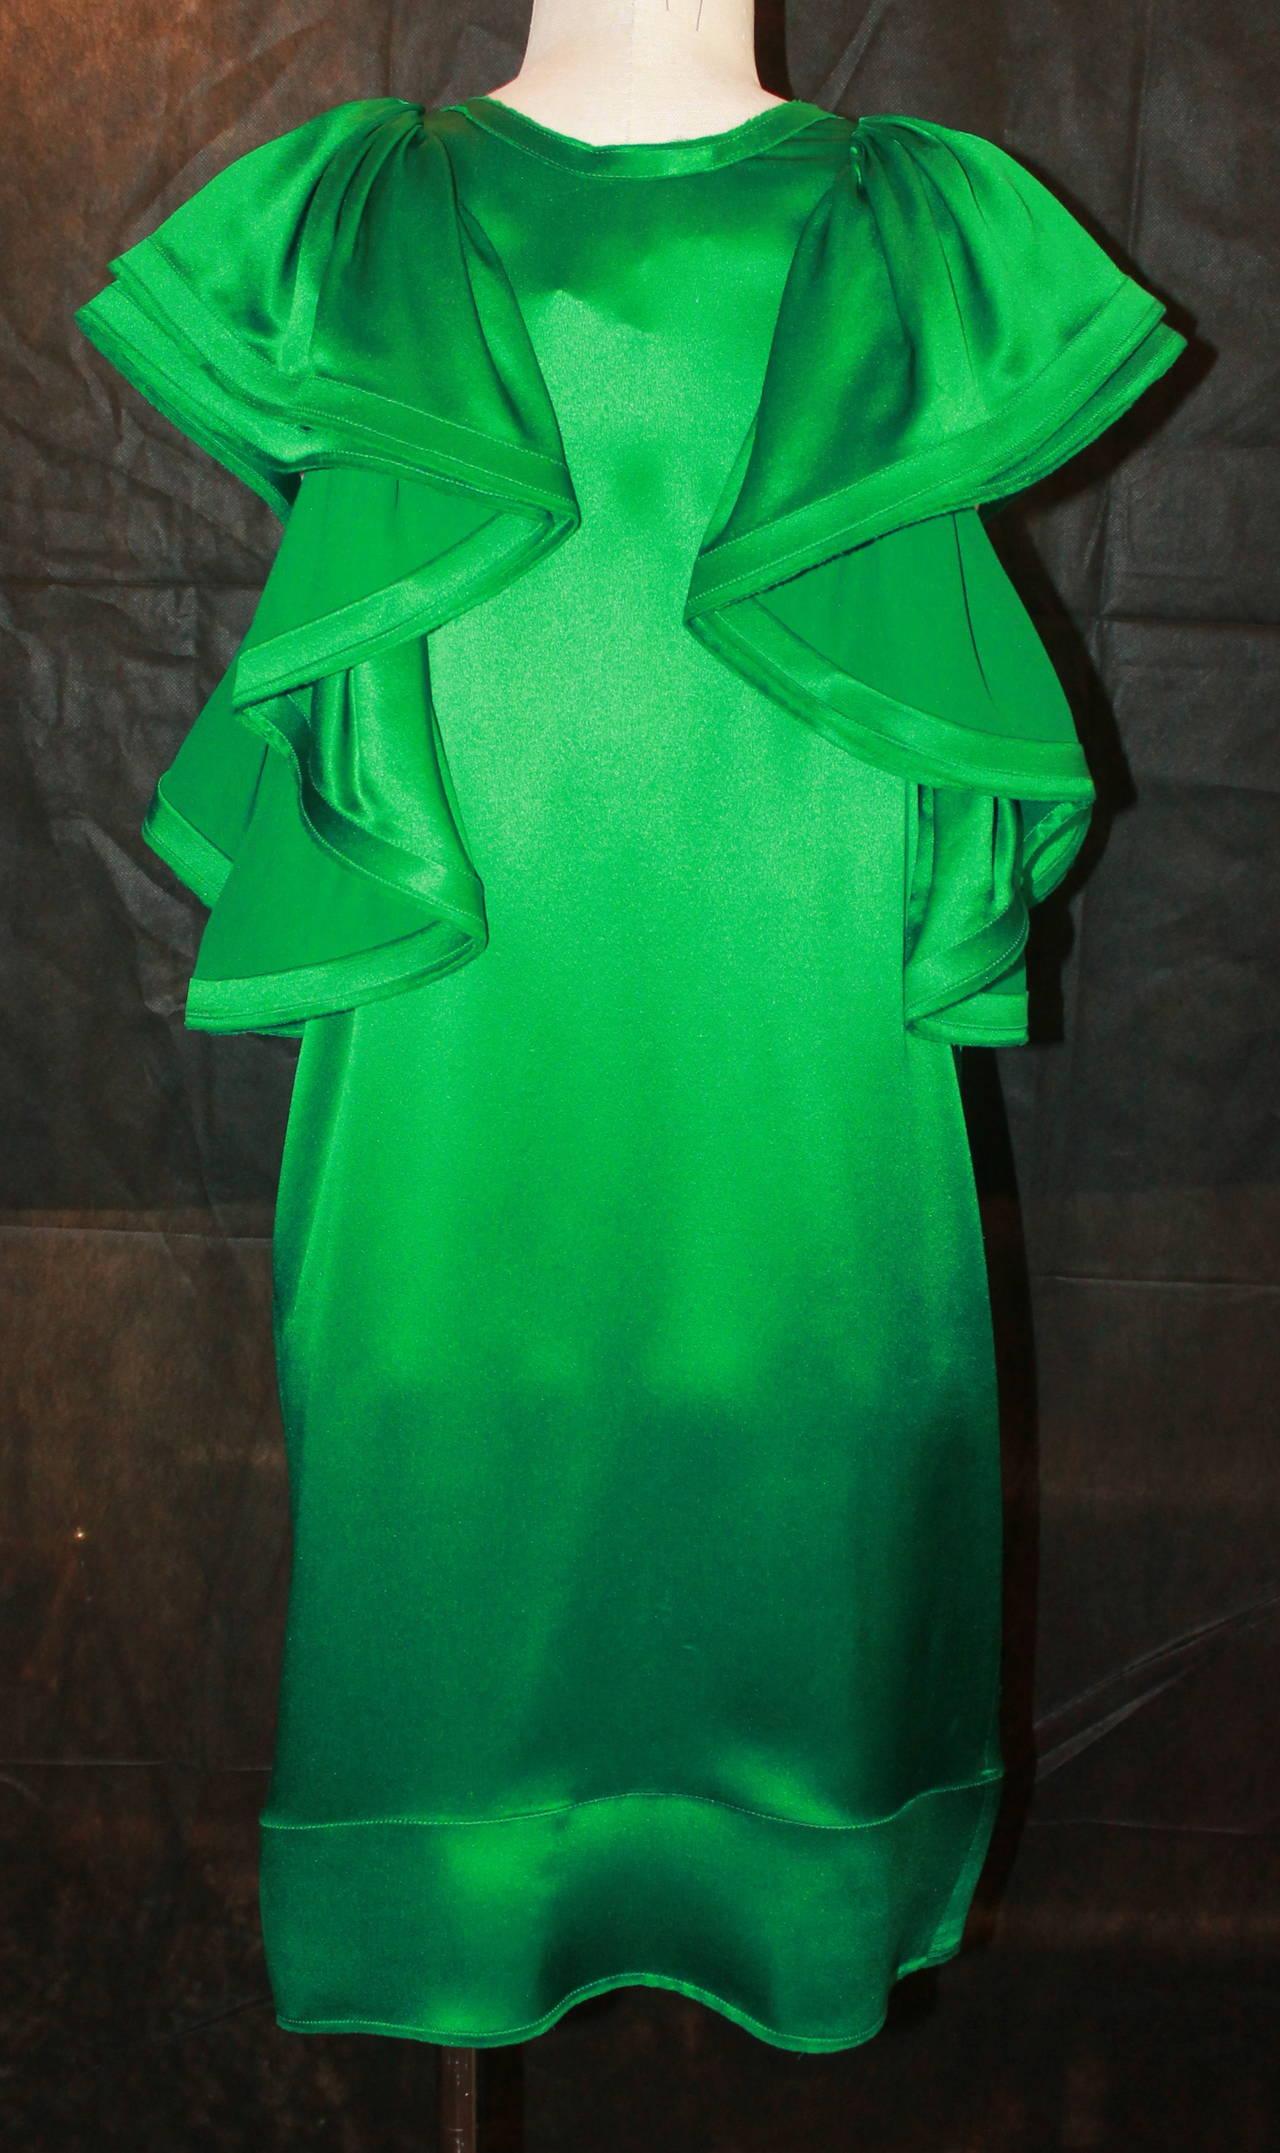 Lanvin Emerald Green Large Ruffle Sleeve Dress - 38 4